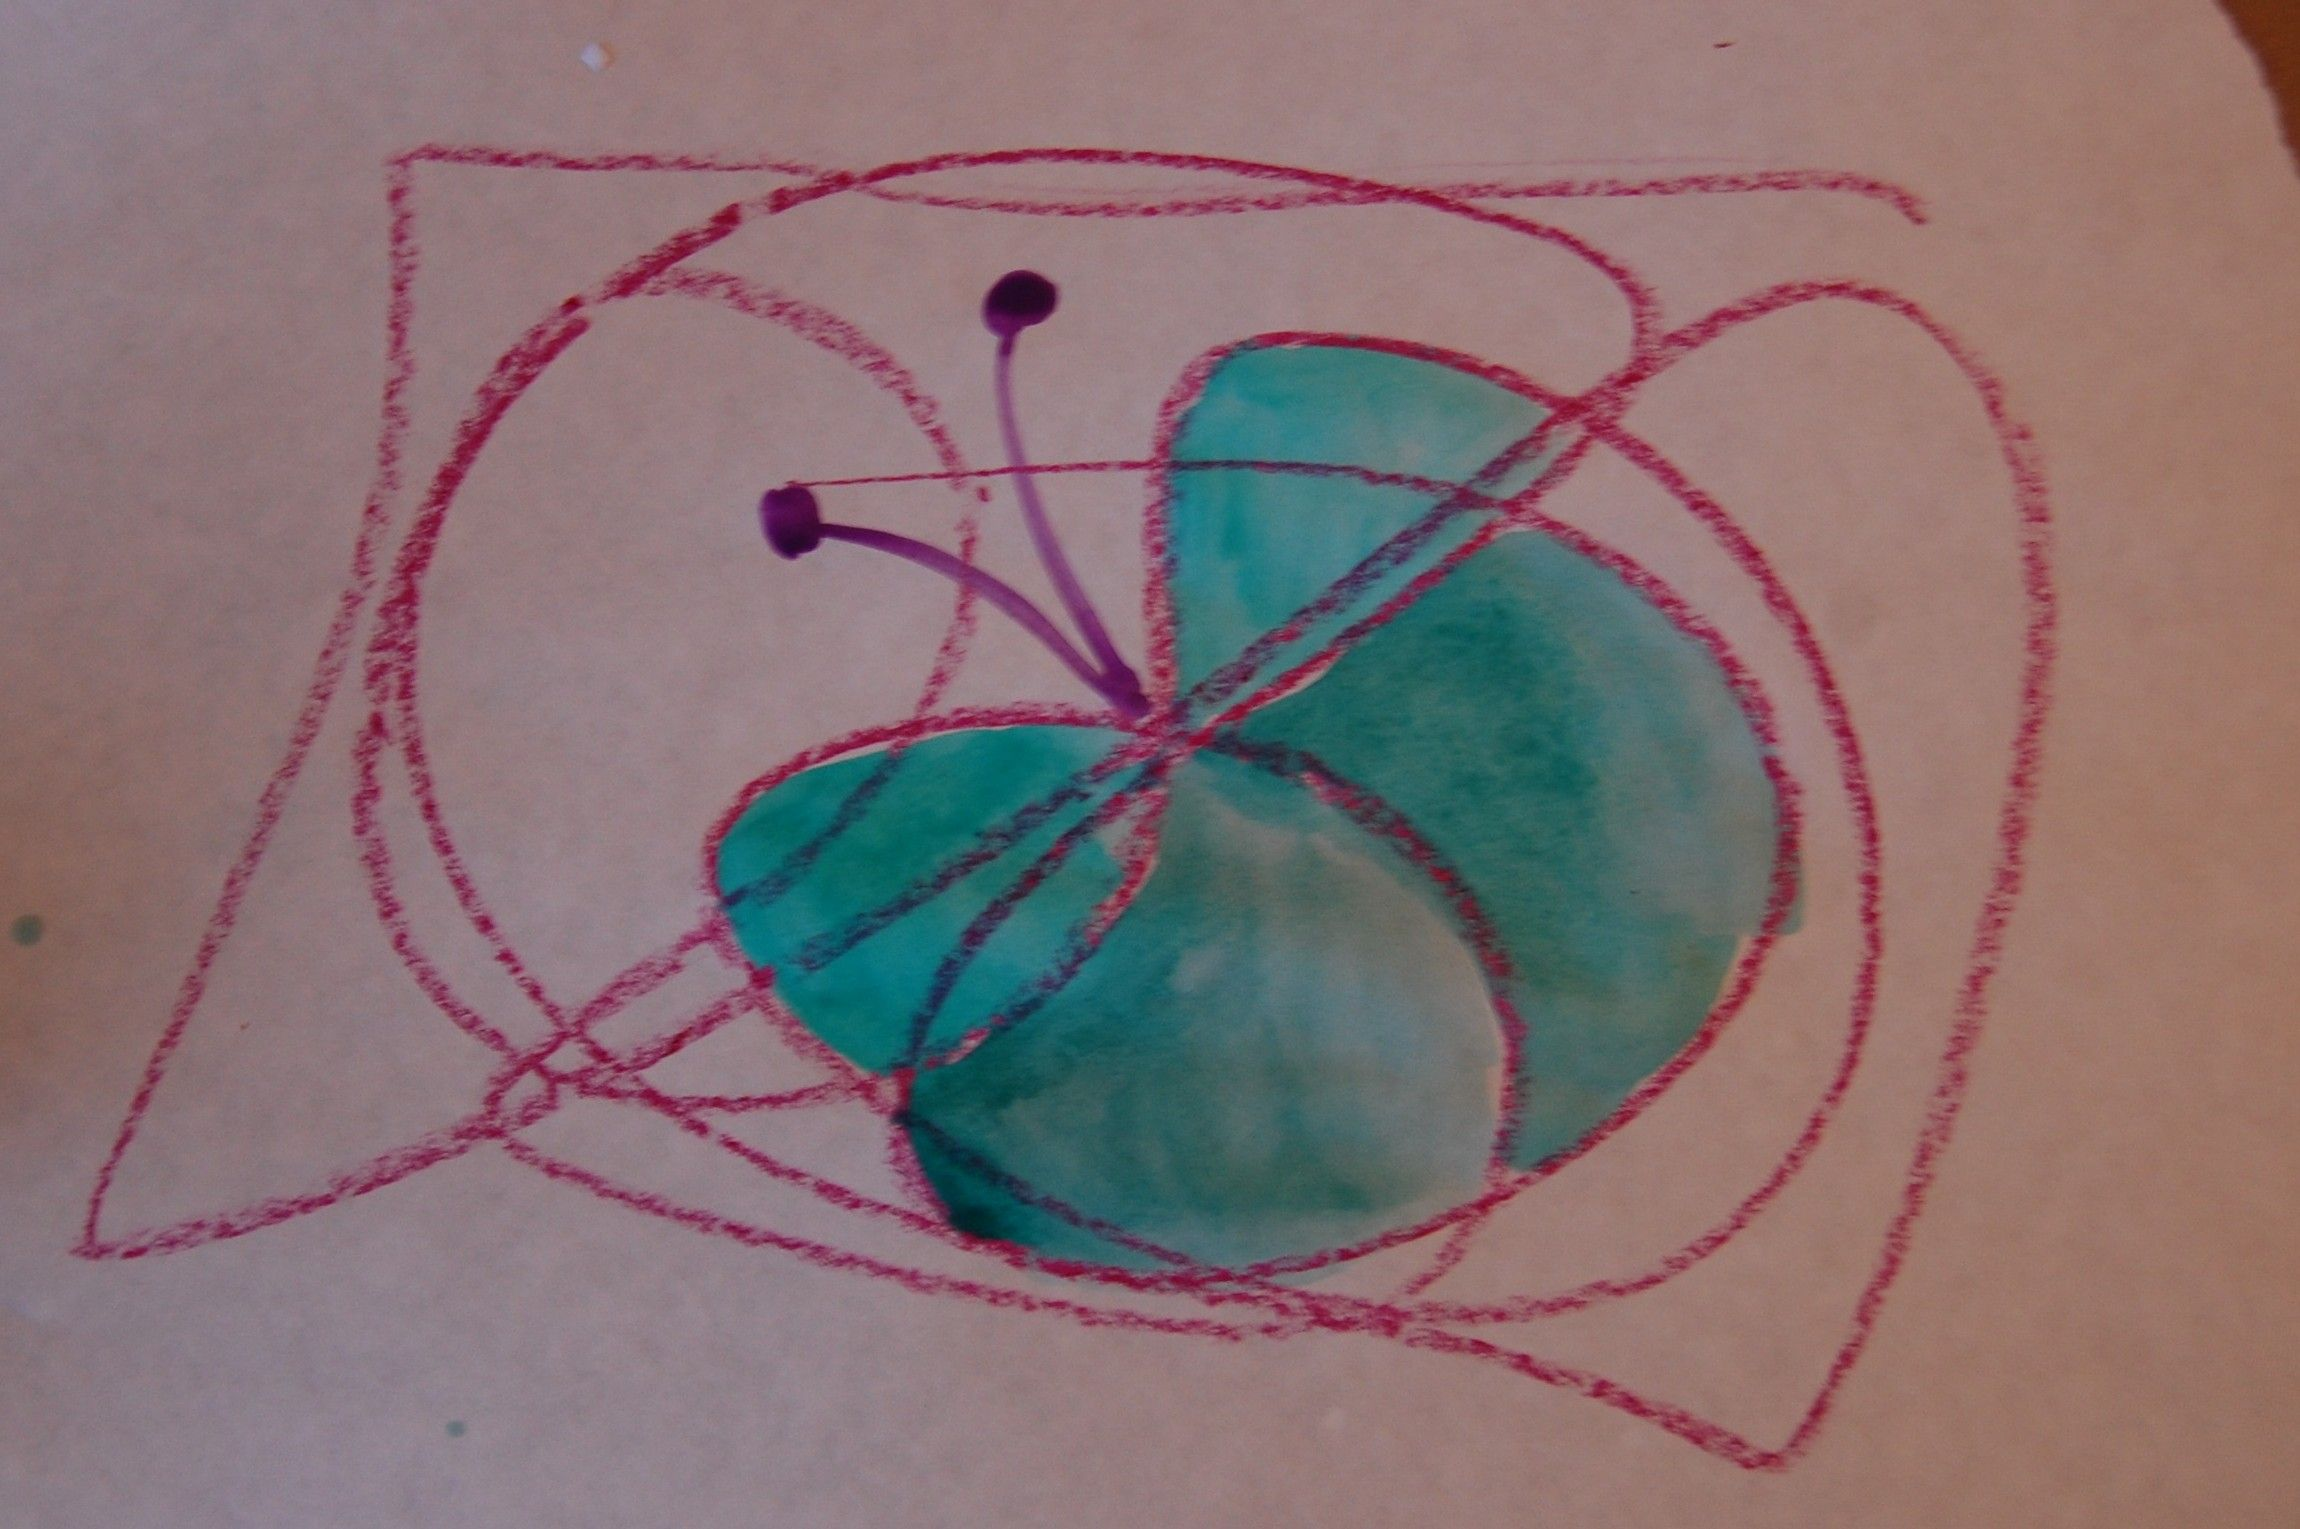 Scribble Drawing For Kids : Scribble drawing kids art